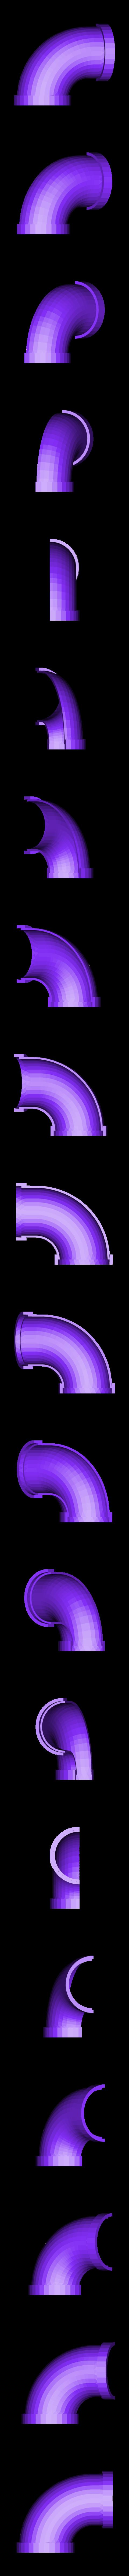 invelox_corner_section_lower_fixed.stl Download free STL file invelox • 3D printable template, Pudedrik